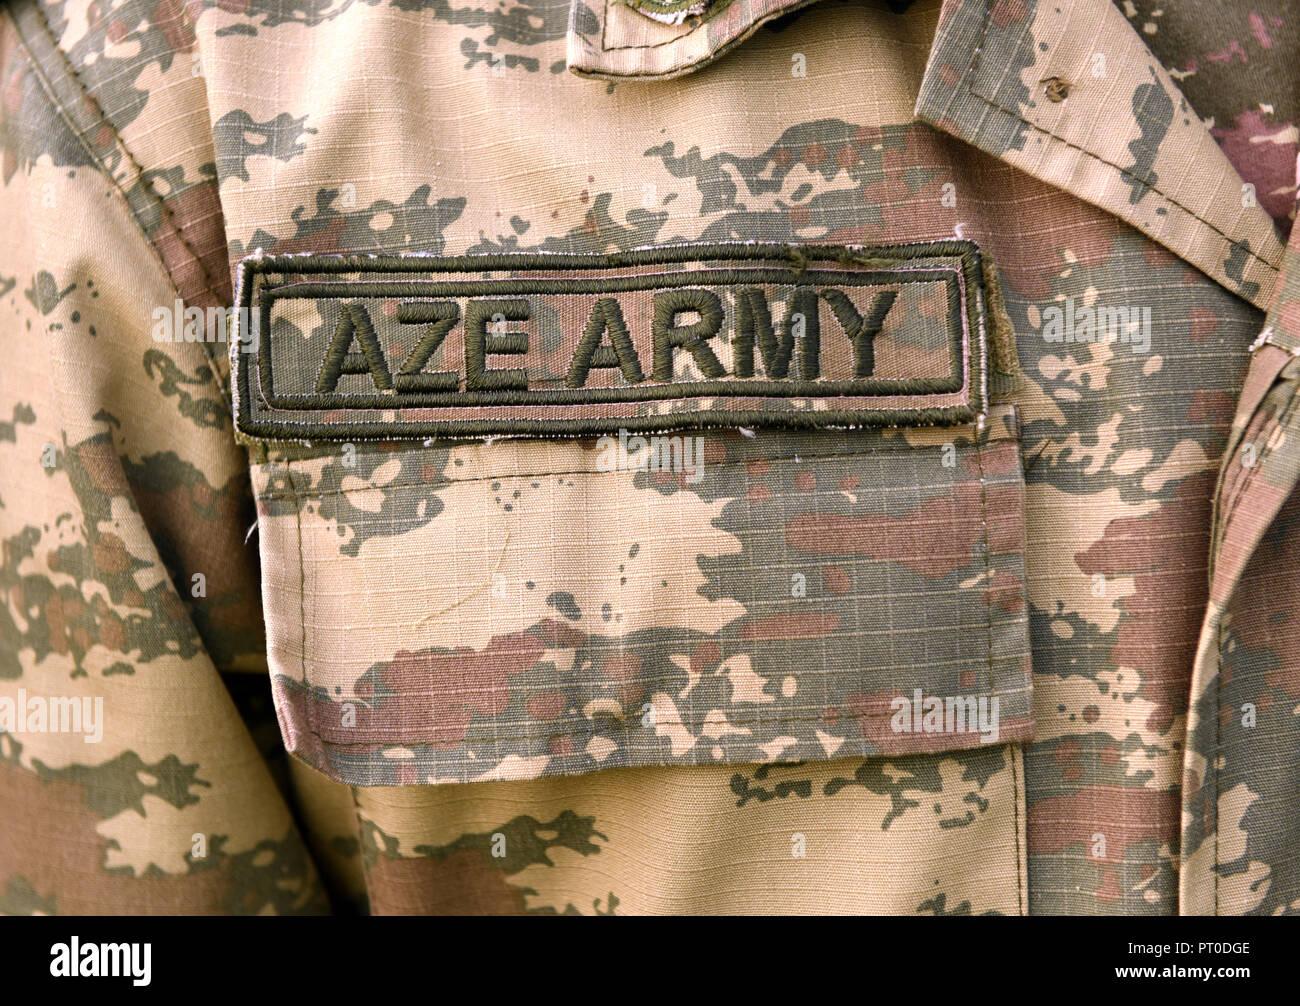 Azerbaijan military uniform. Azerbaijan Army - Stock Image